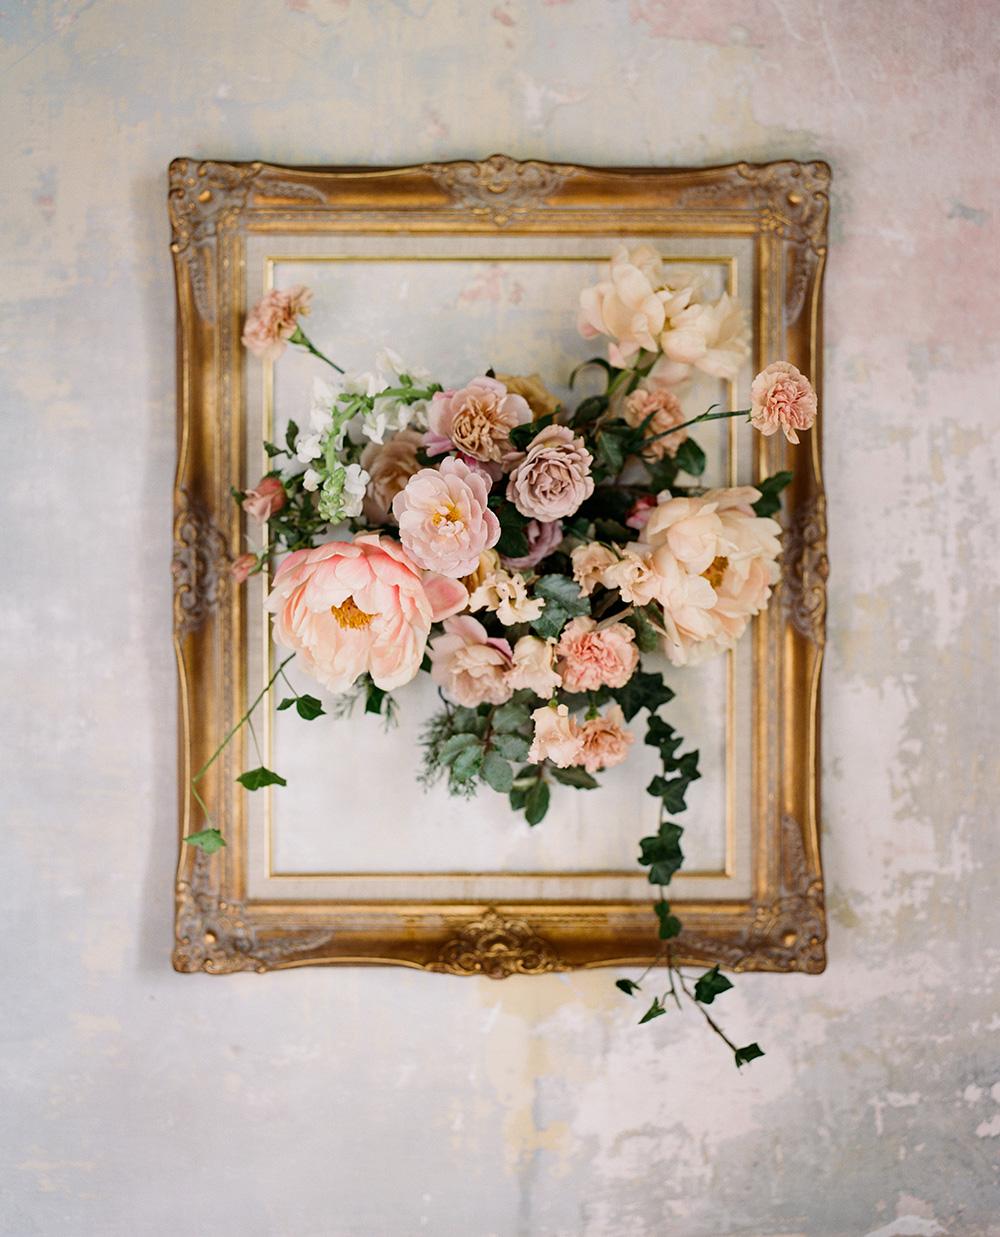 Sara Donaldson_Celedon Style_Artfully Framed WEB_0006.jpg